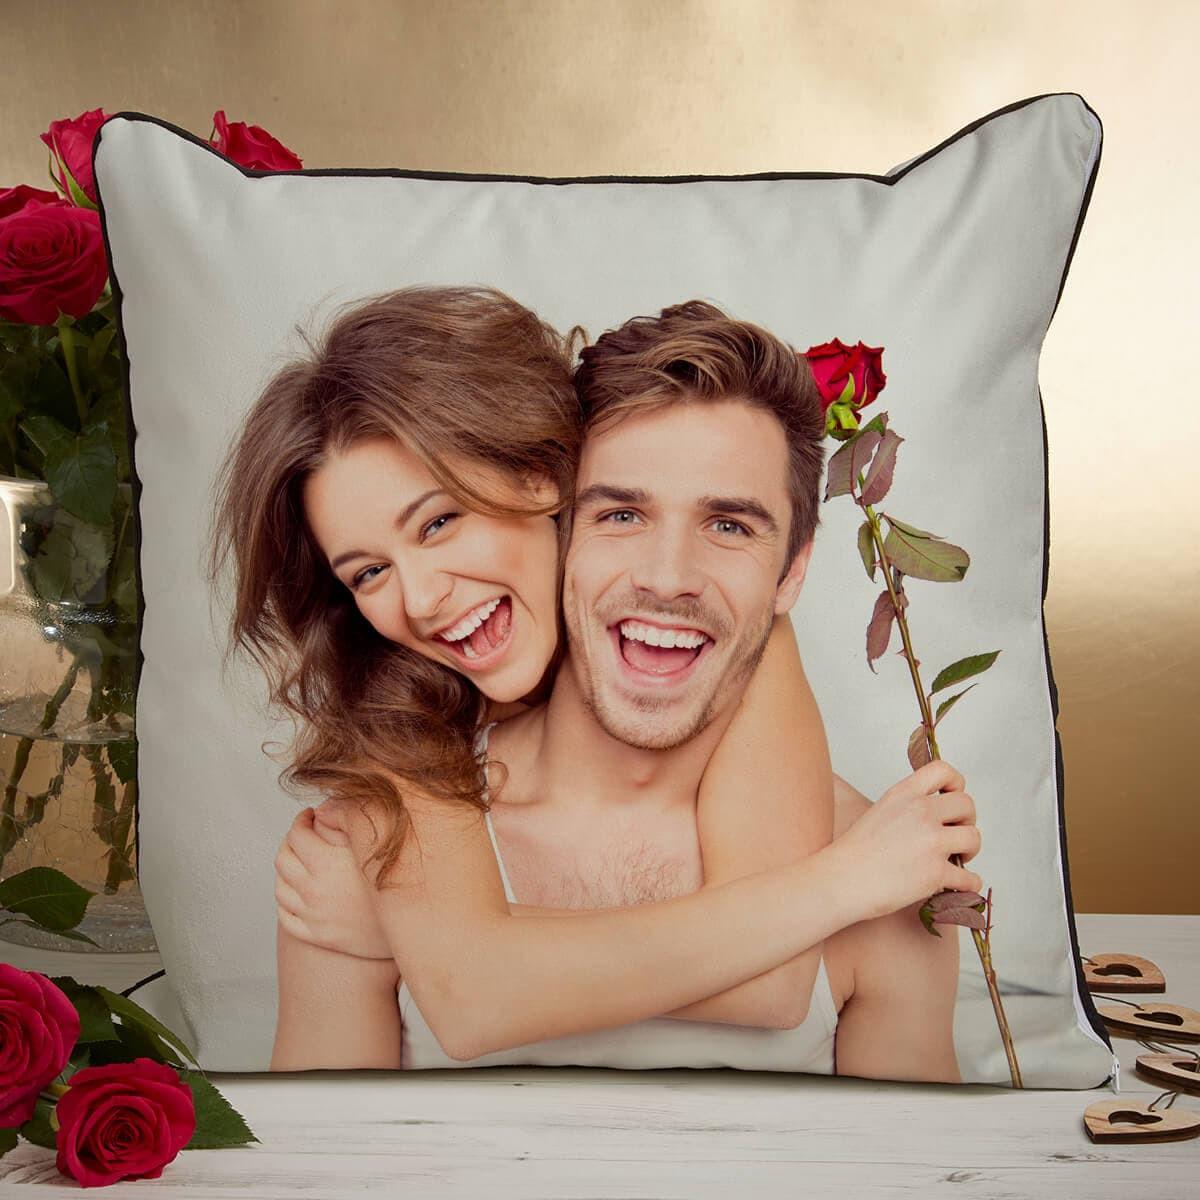 Personalised Couple Photo Piped Edge Cushion